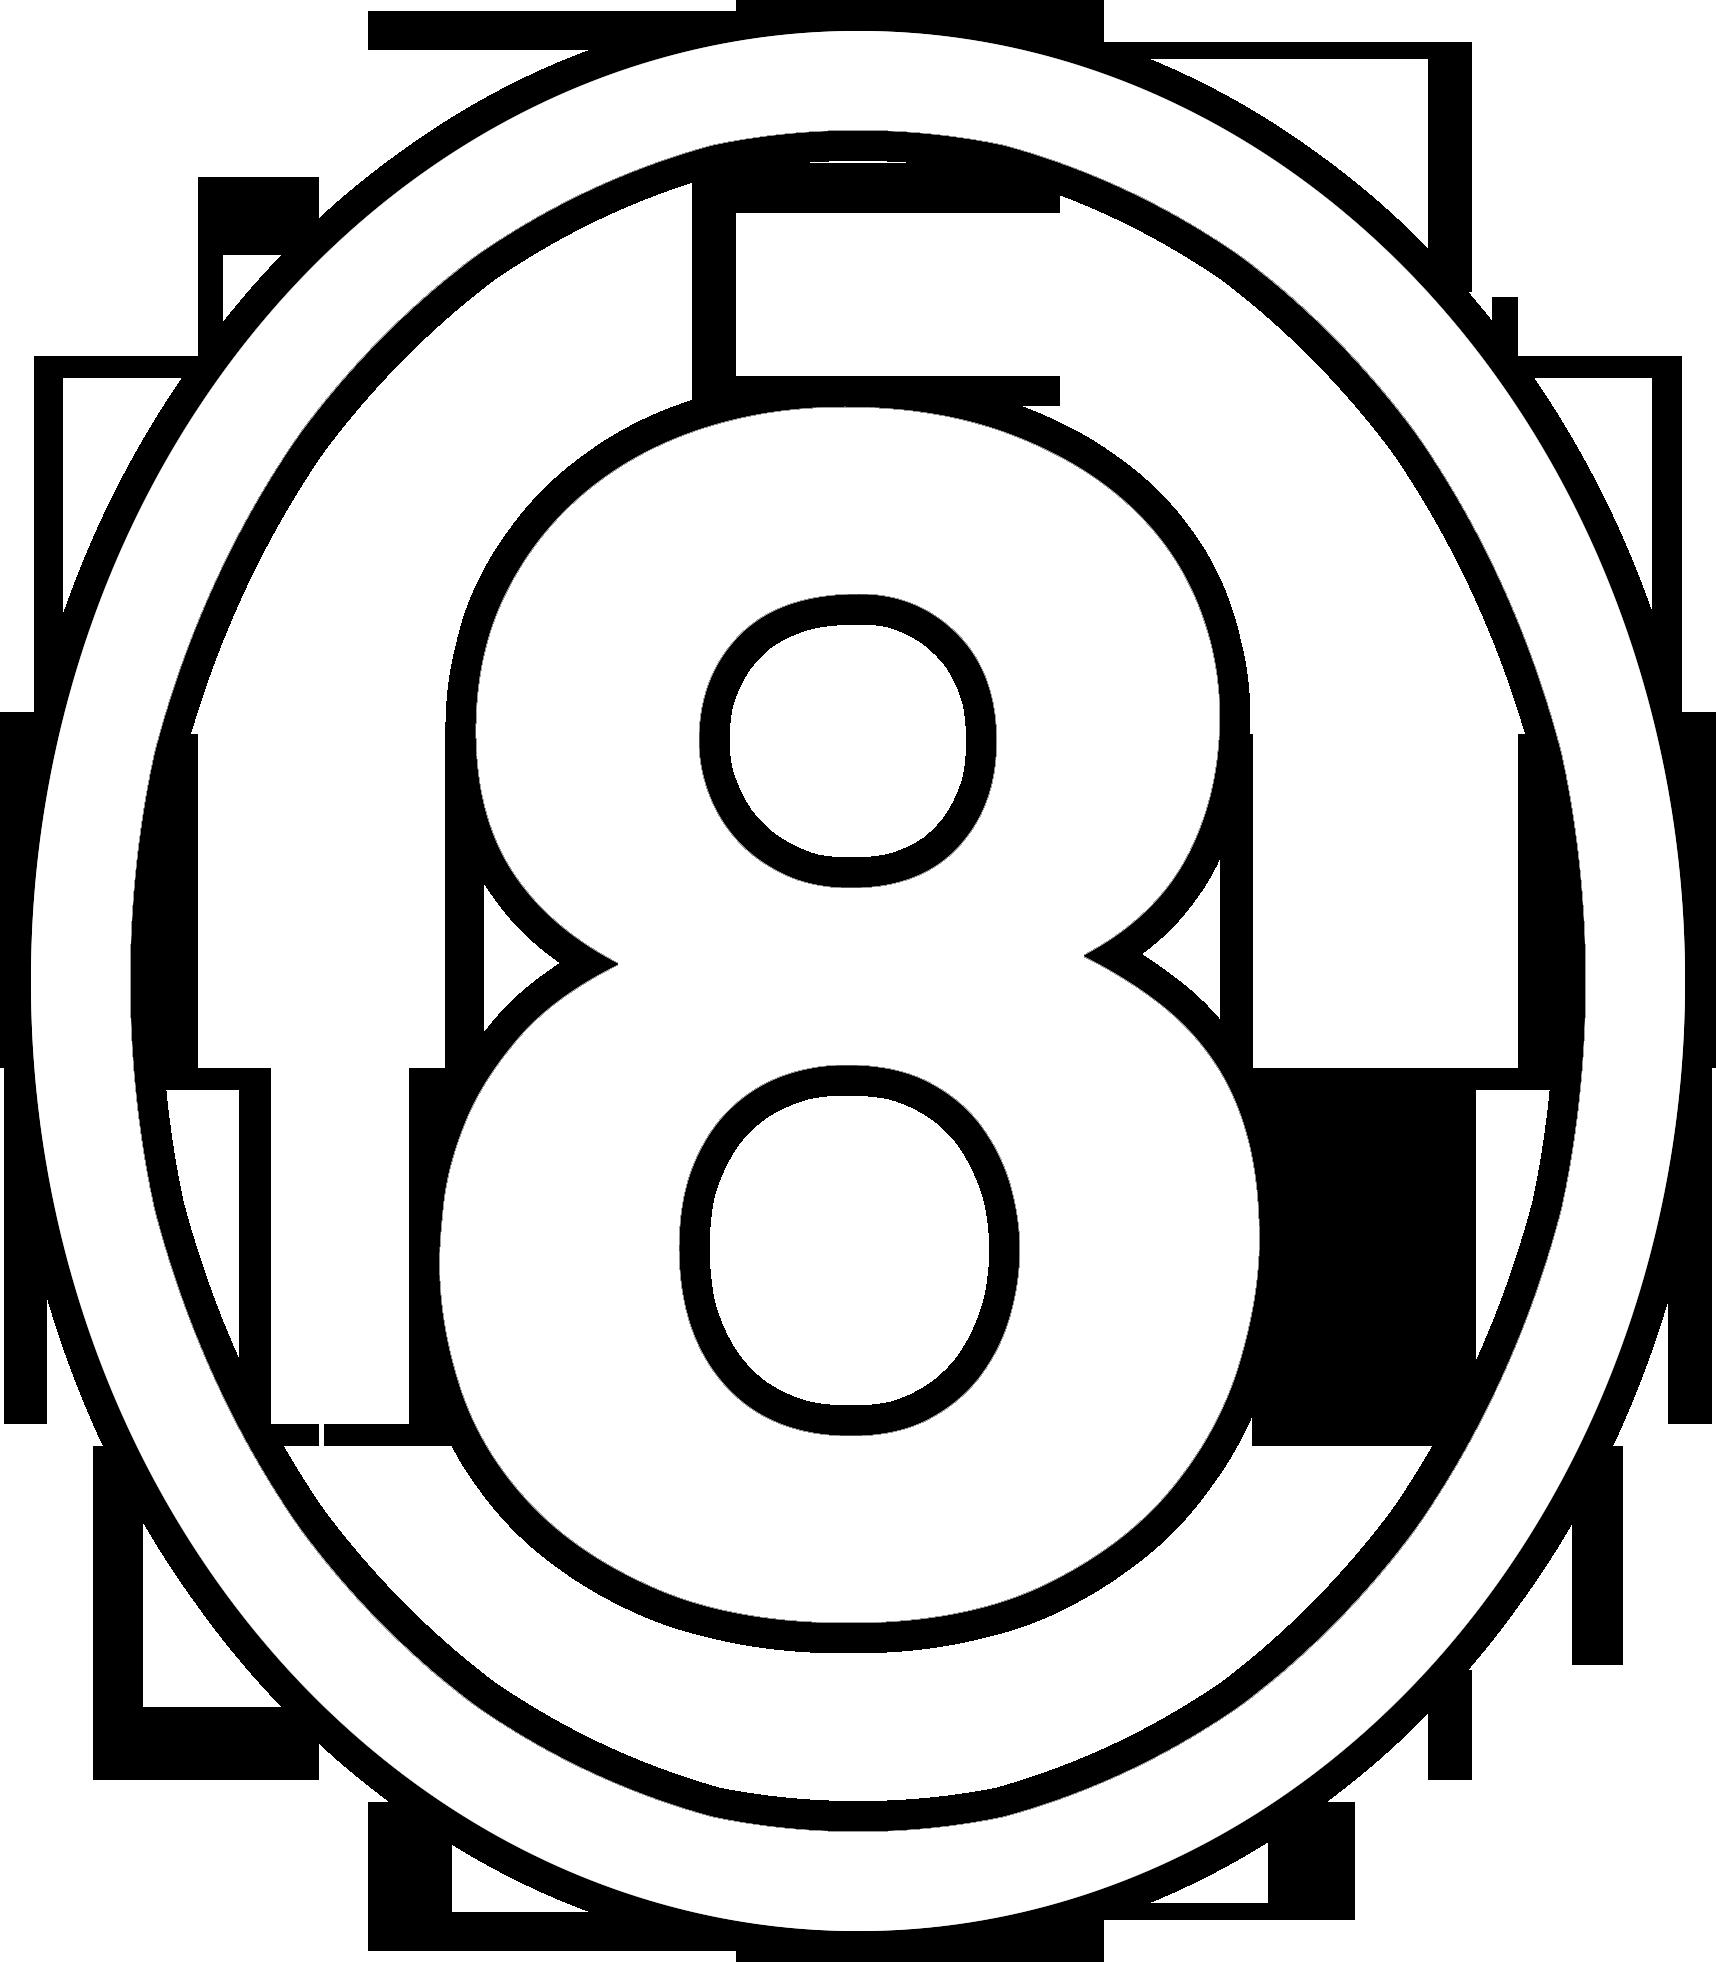 8 канал (г. Йошкар-Ола) (1998-2002, контур)